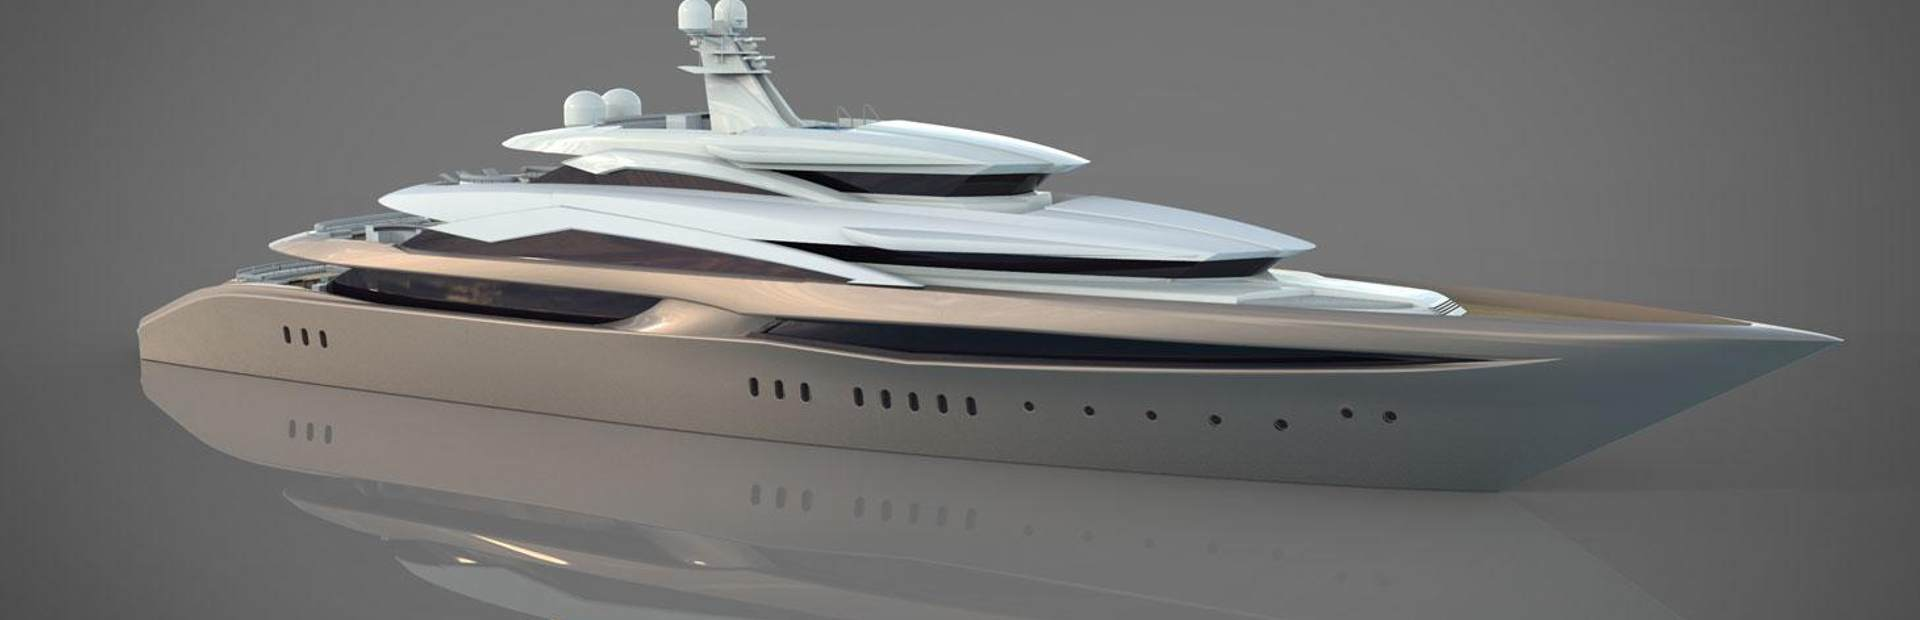 Columbus Classic 80 MT Yacht Charter